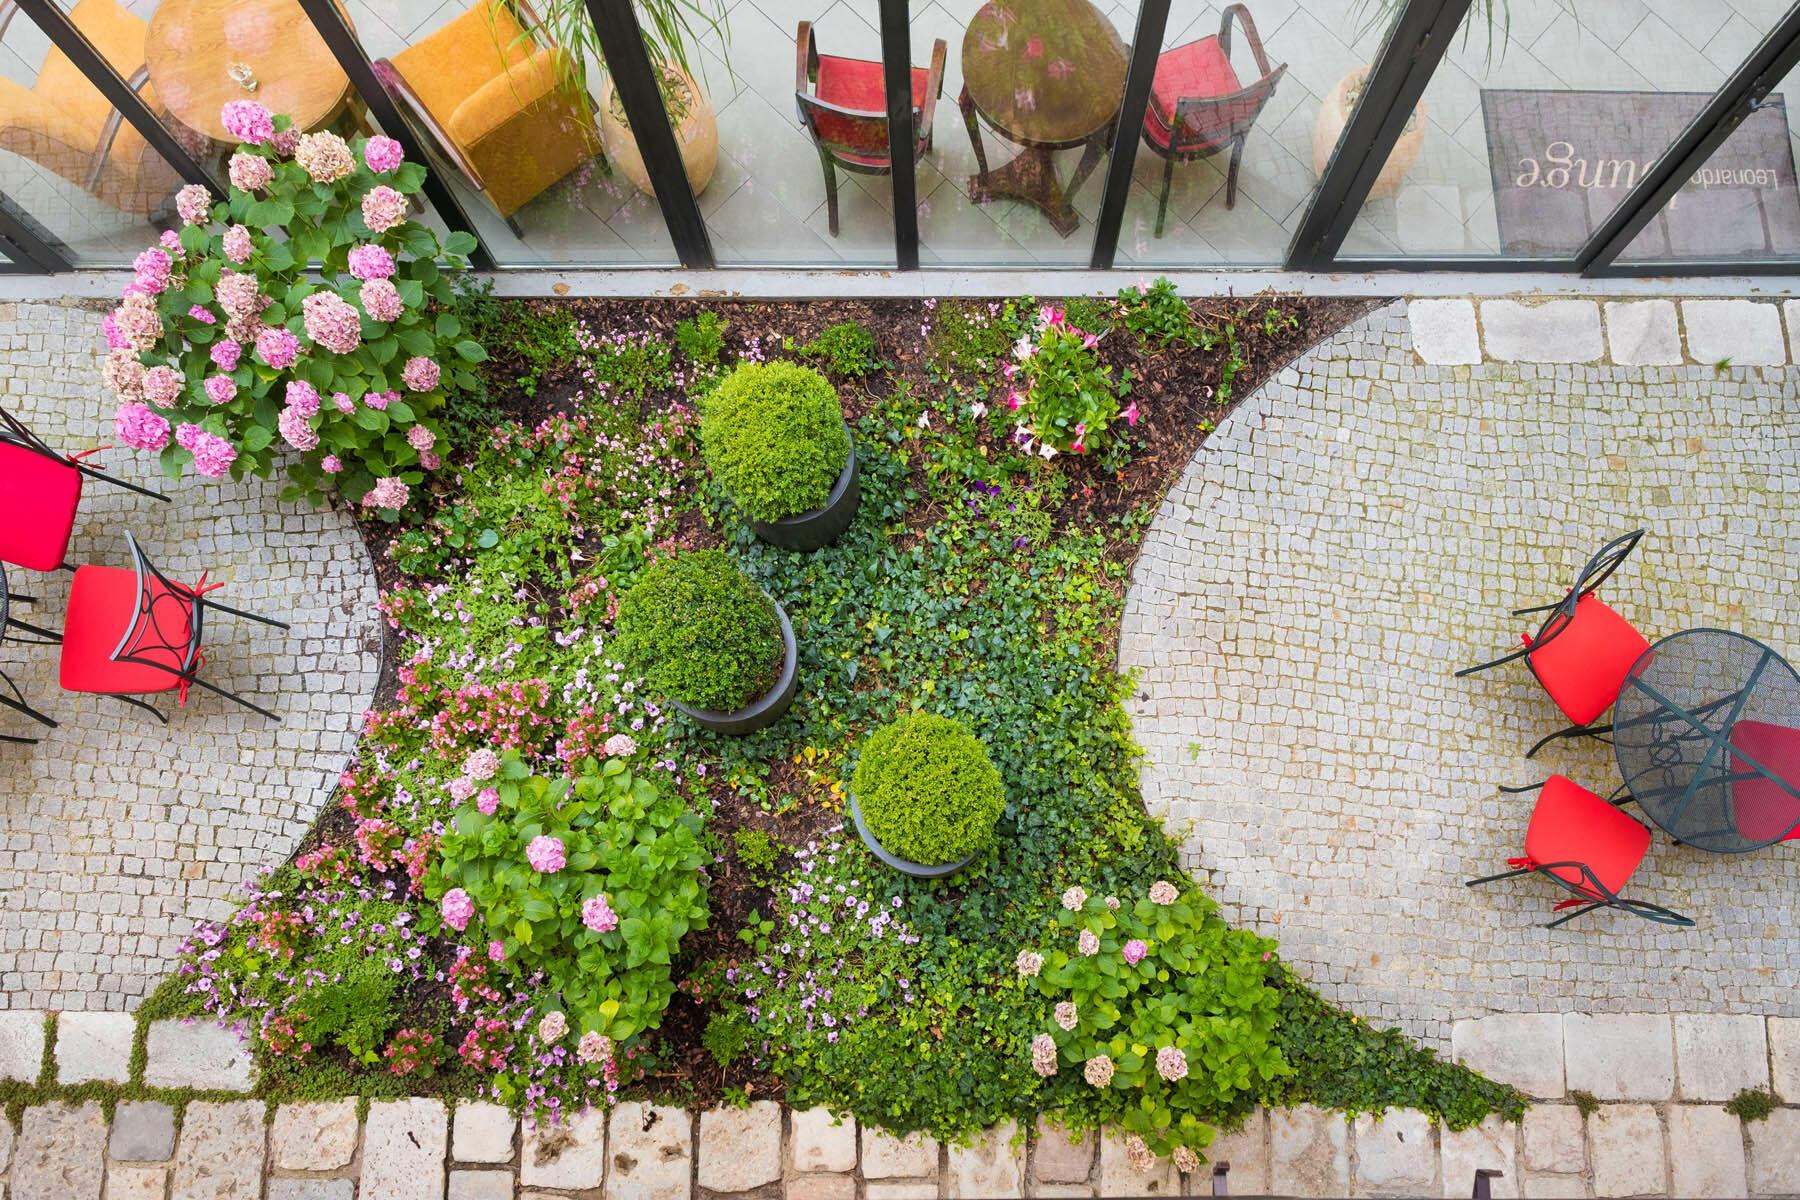 Winter Garden at Hotel Leonardo, Prague 1, Czech Republic